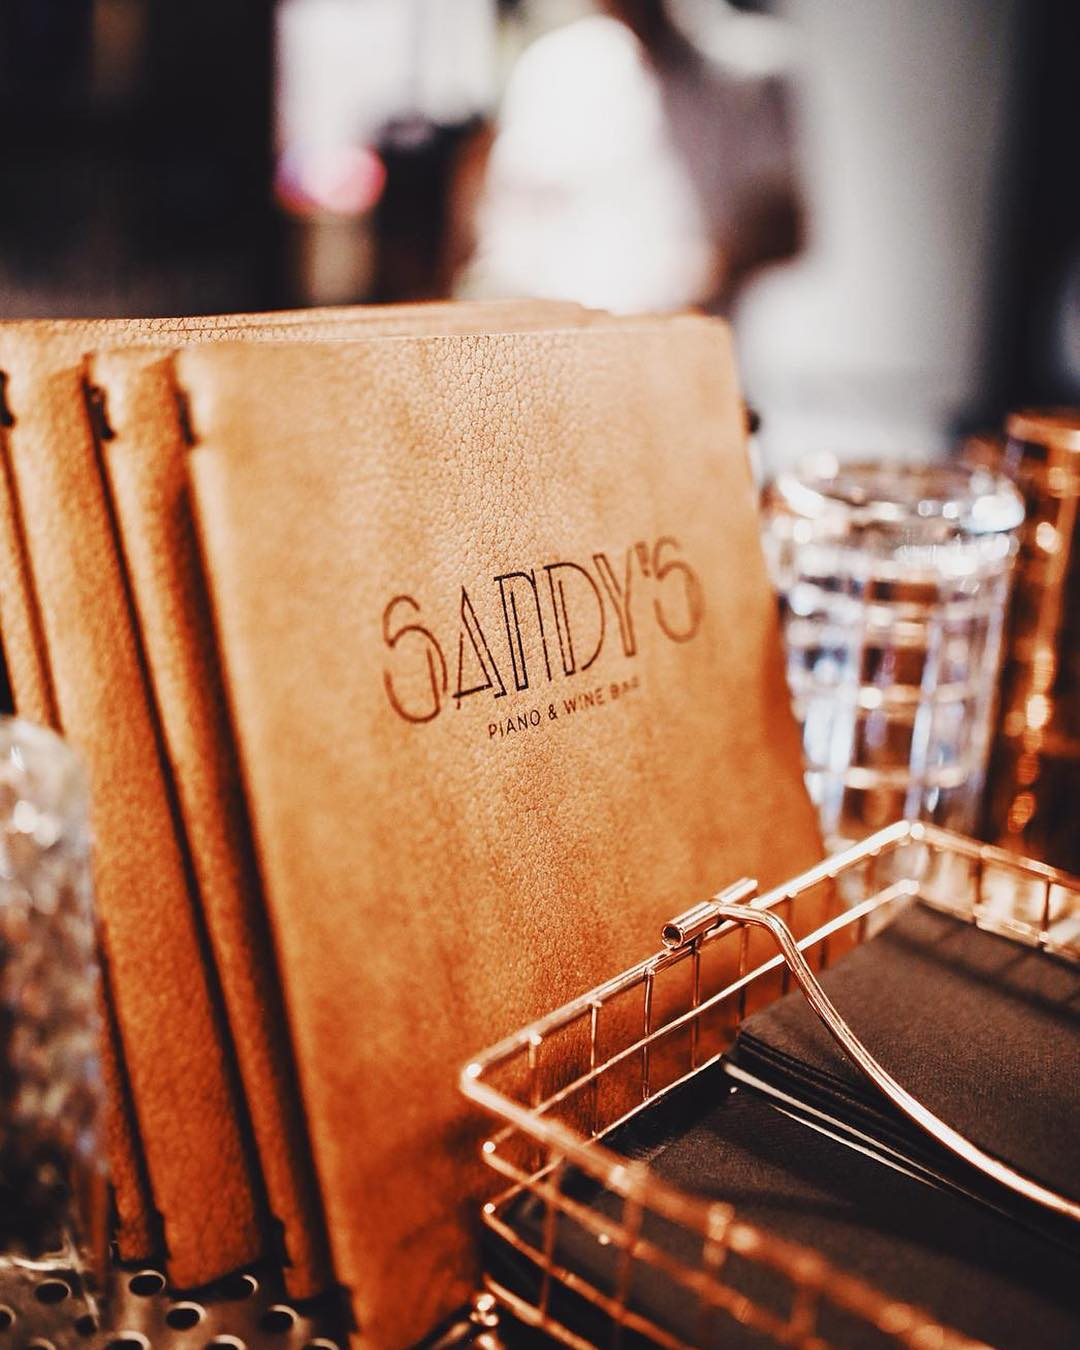 Sandy's Piano & Wine Bar